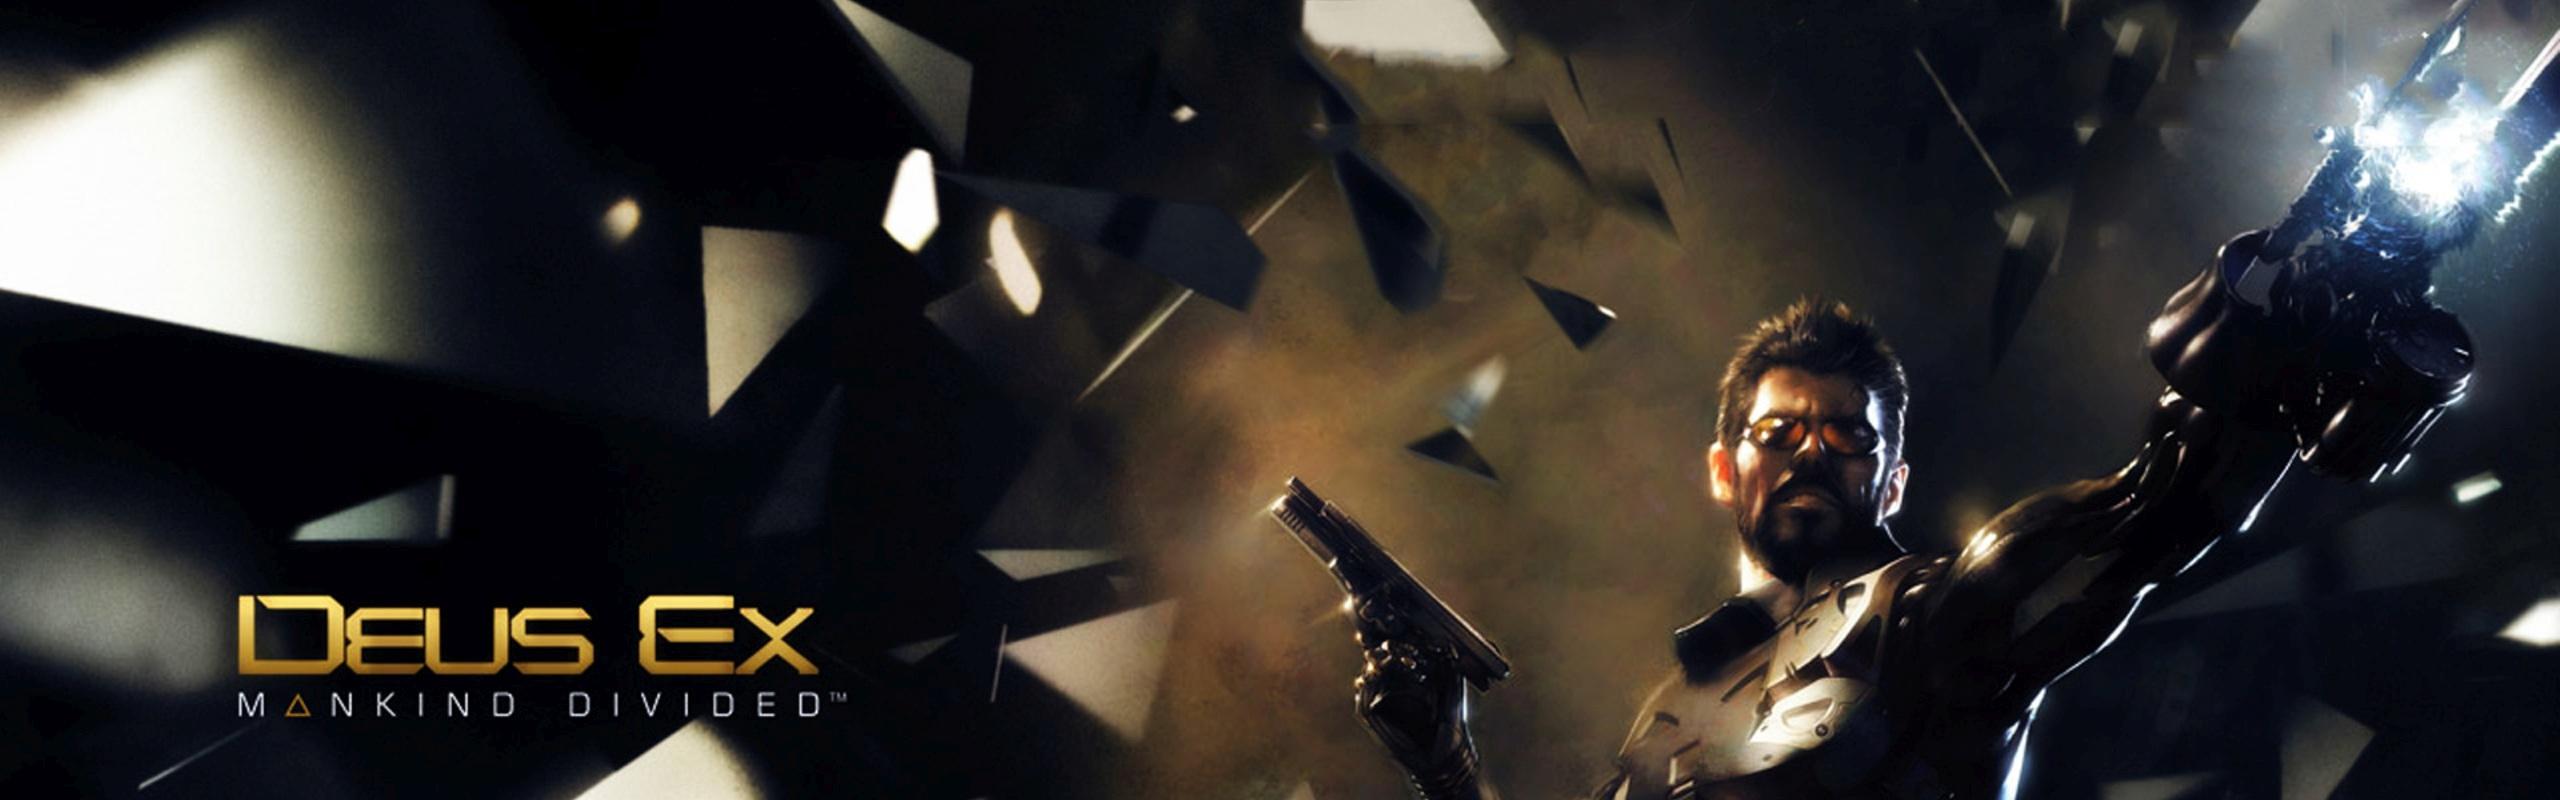 Deus Ex: Mankind Divided (Season Pass) (DLC) Steam Key EUROPE